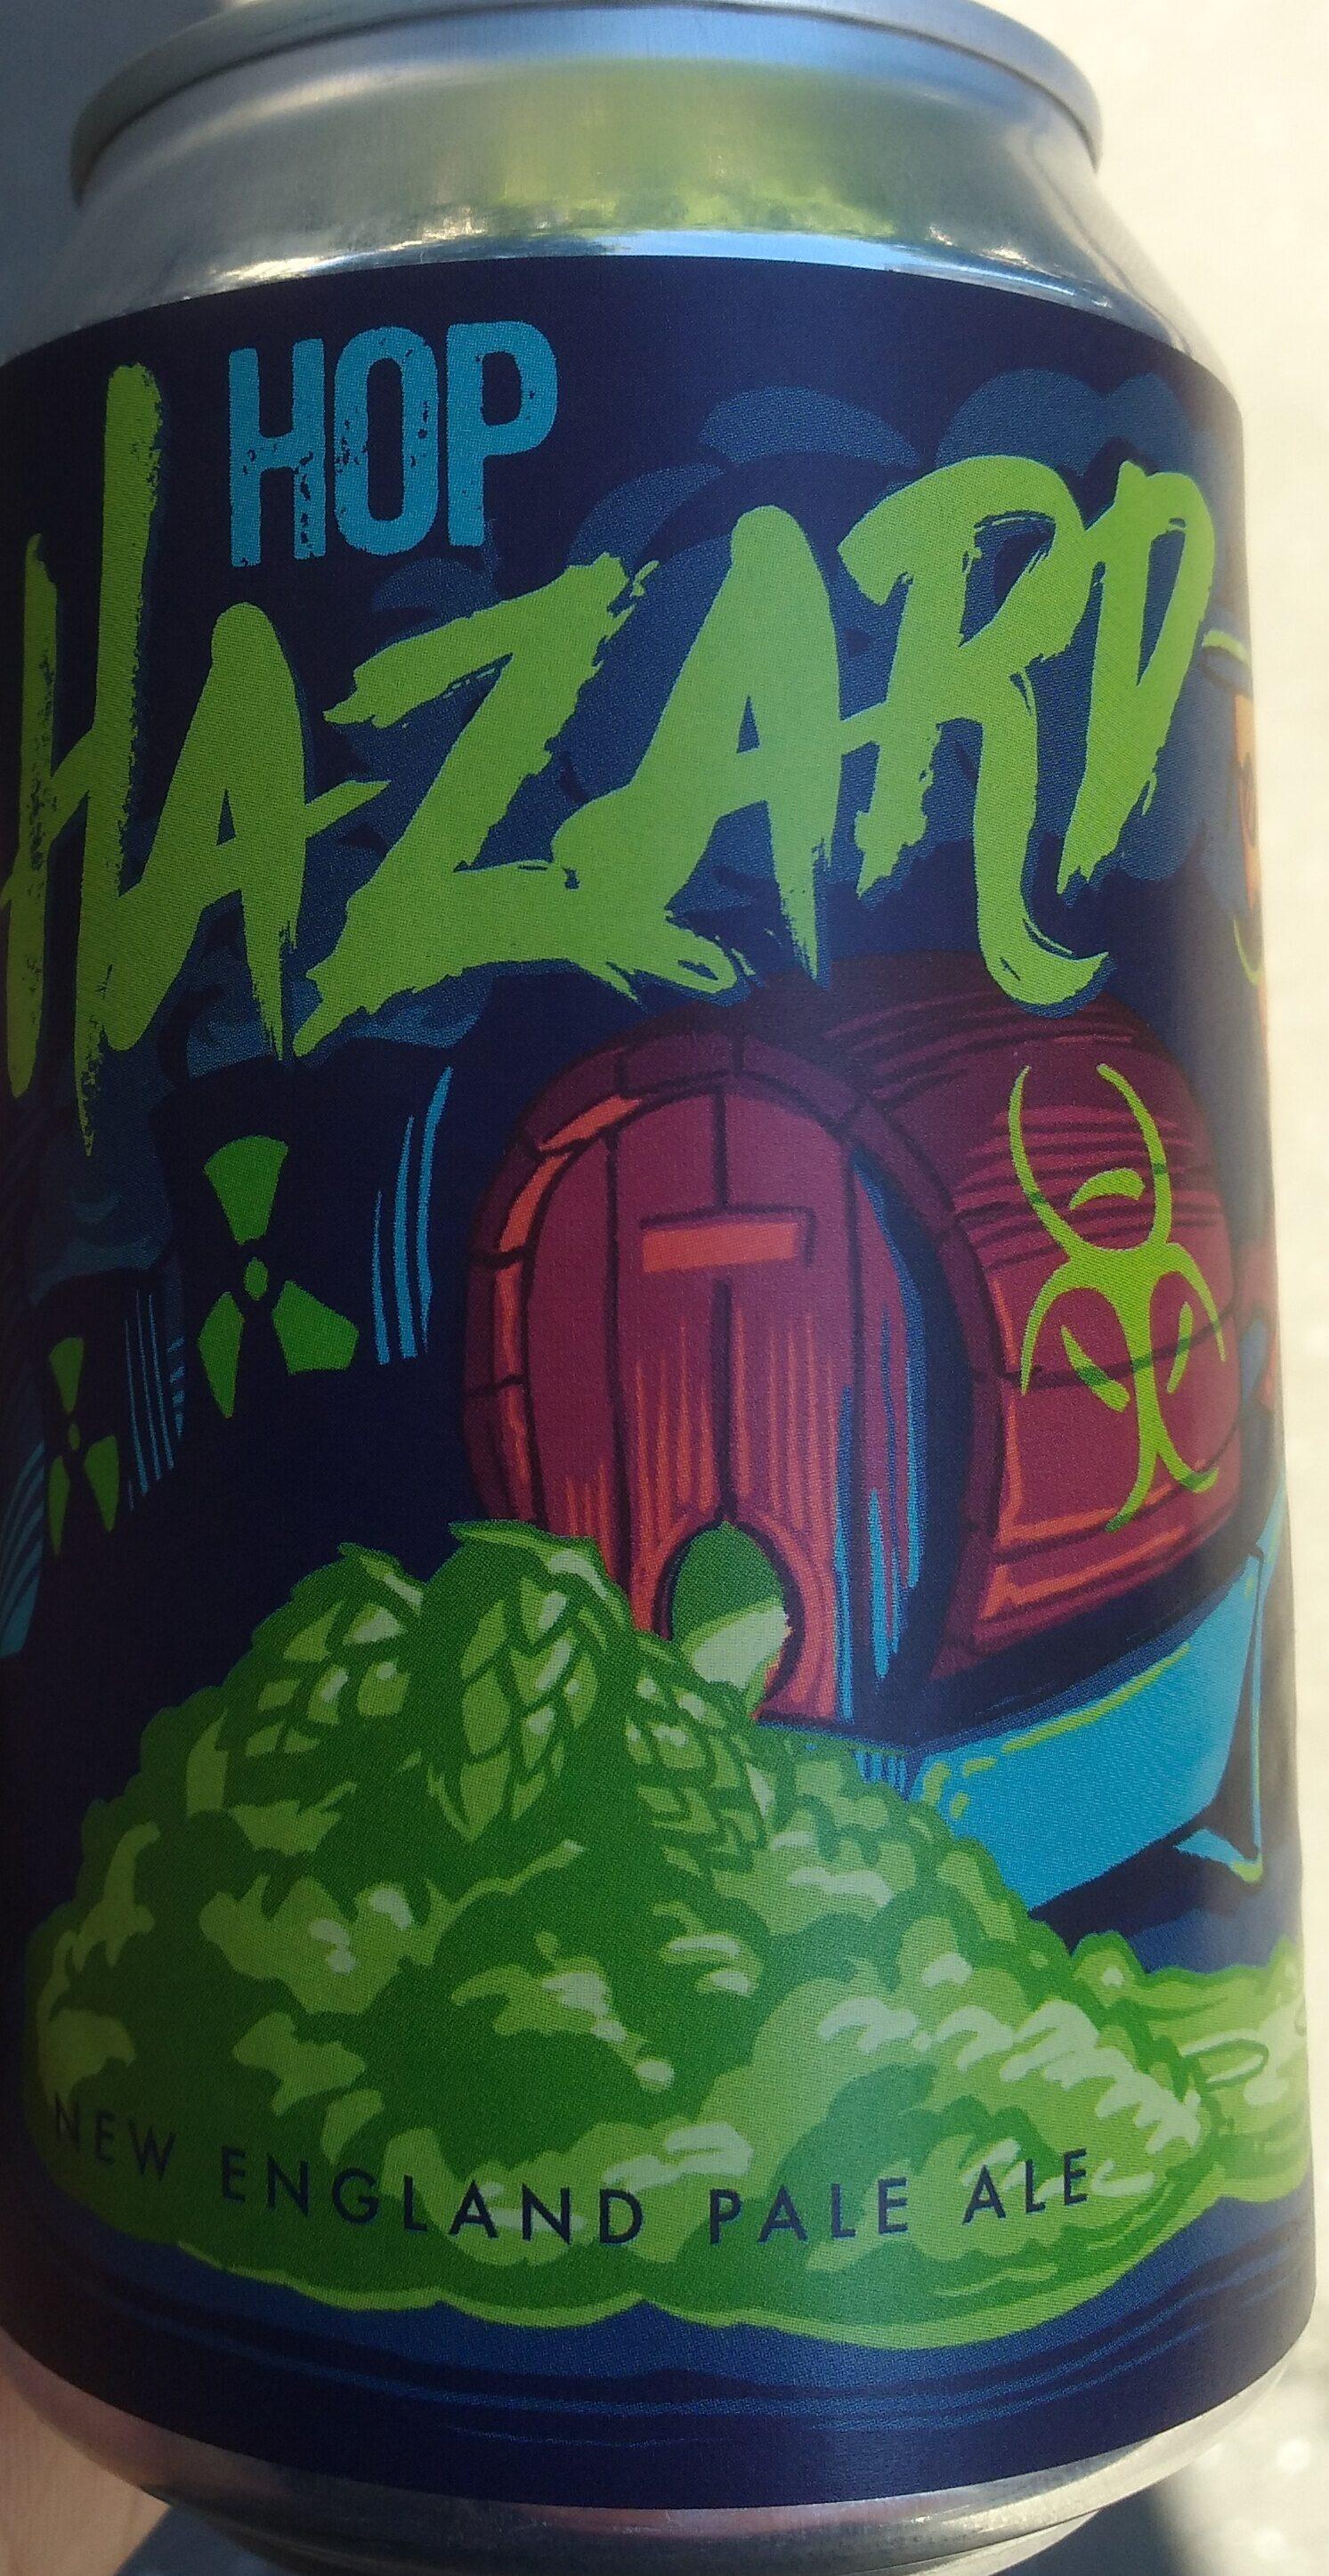 Hop Hazard - Product - fr